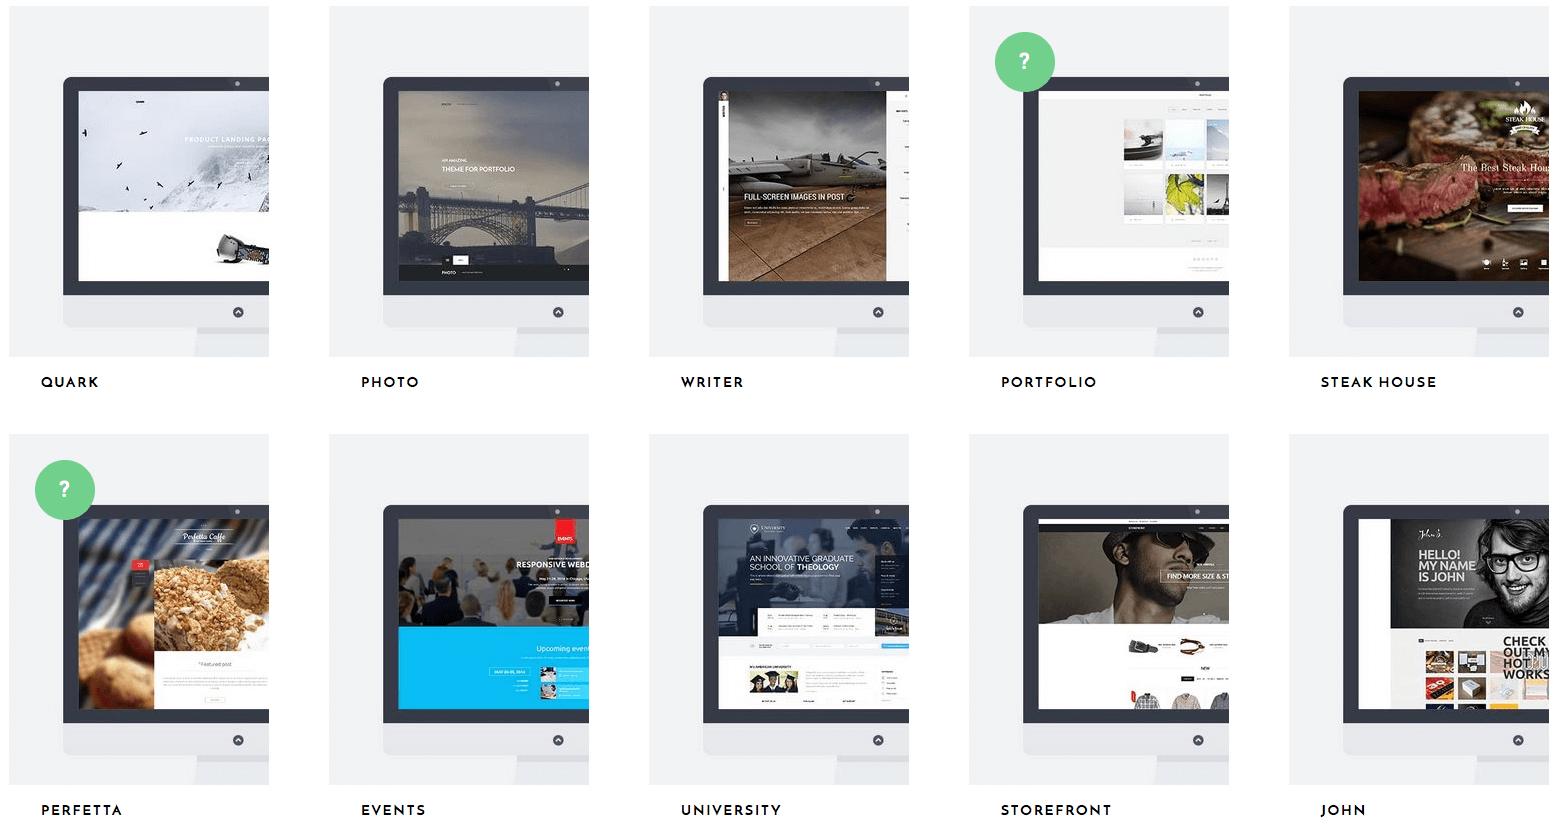 Wordpress- und Joomla-Themes